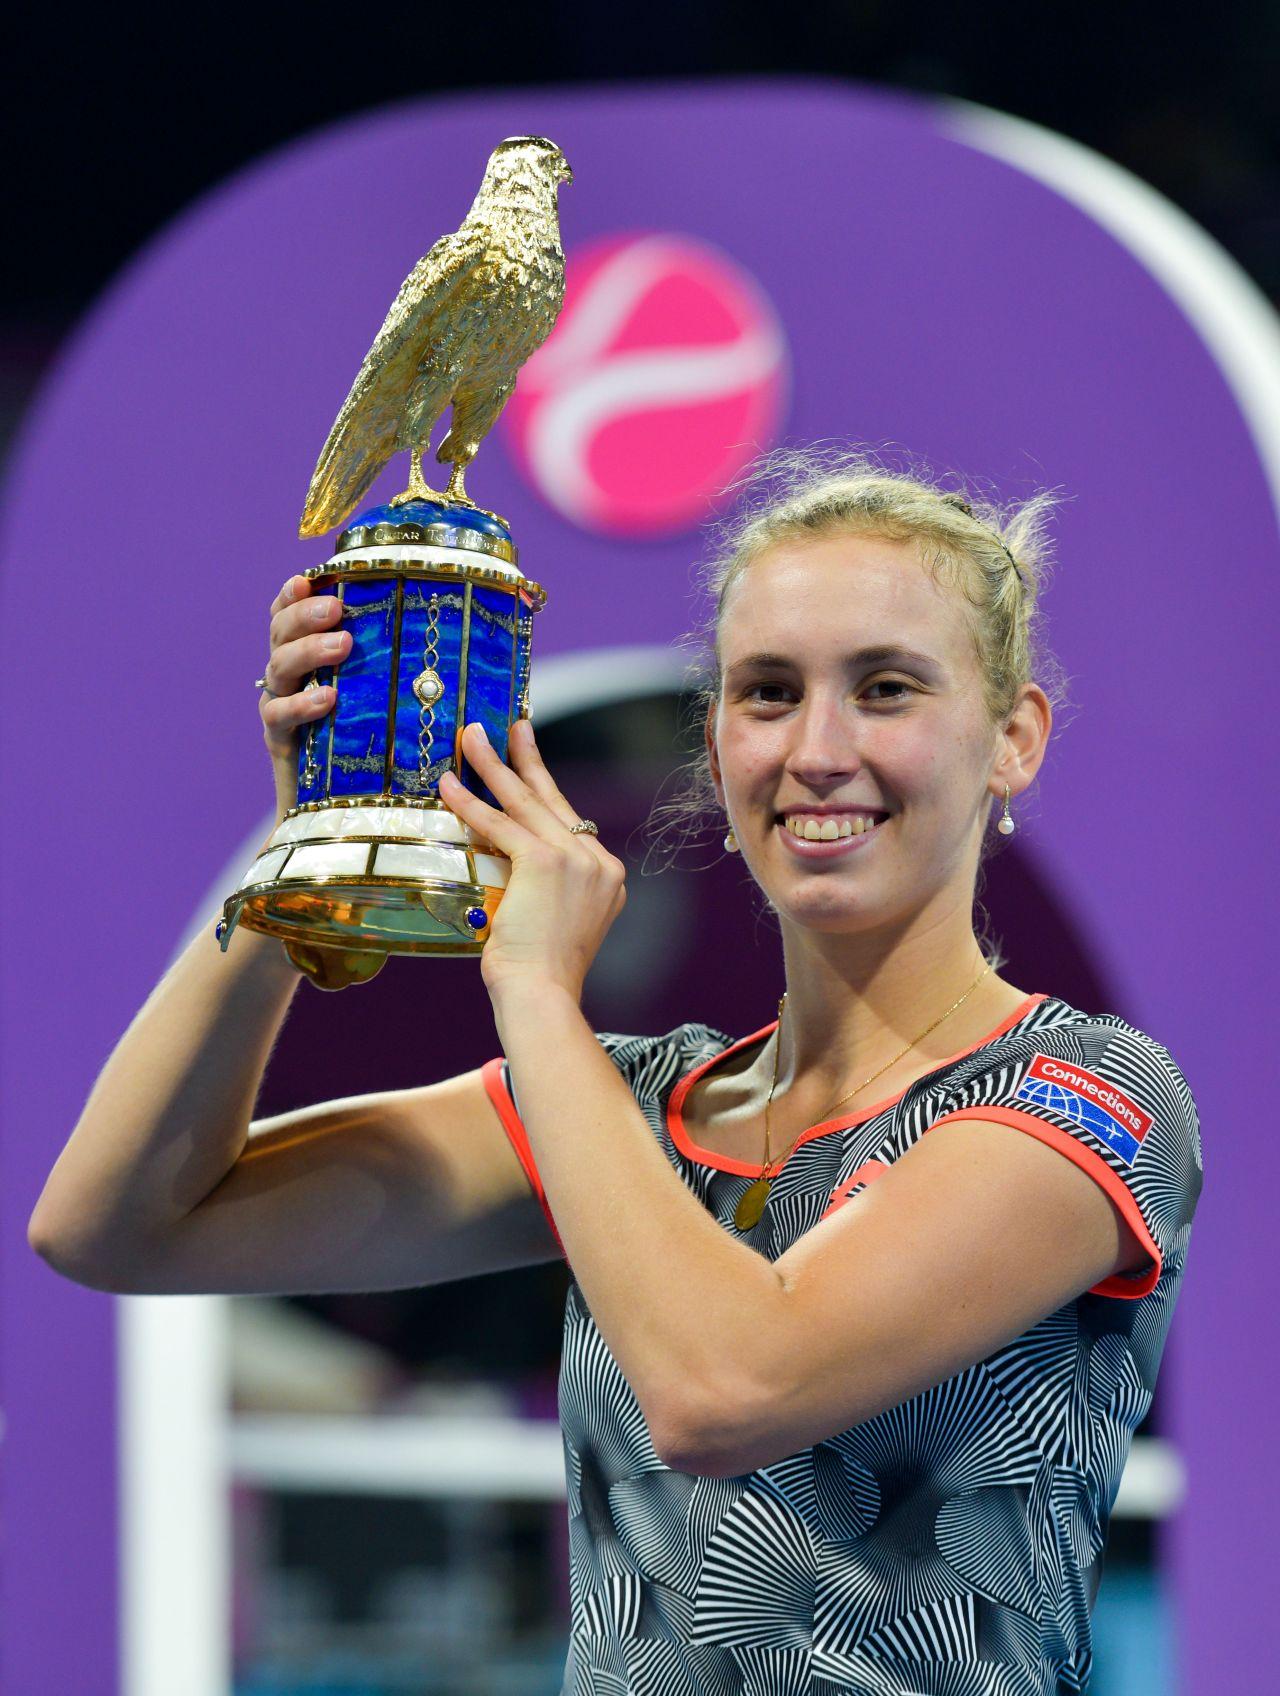 talang final 2019 vinnare